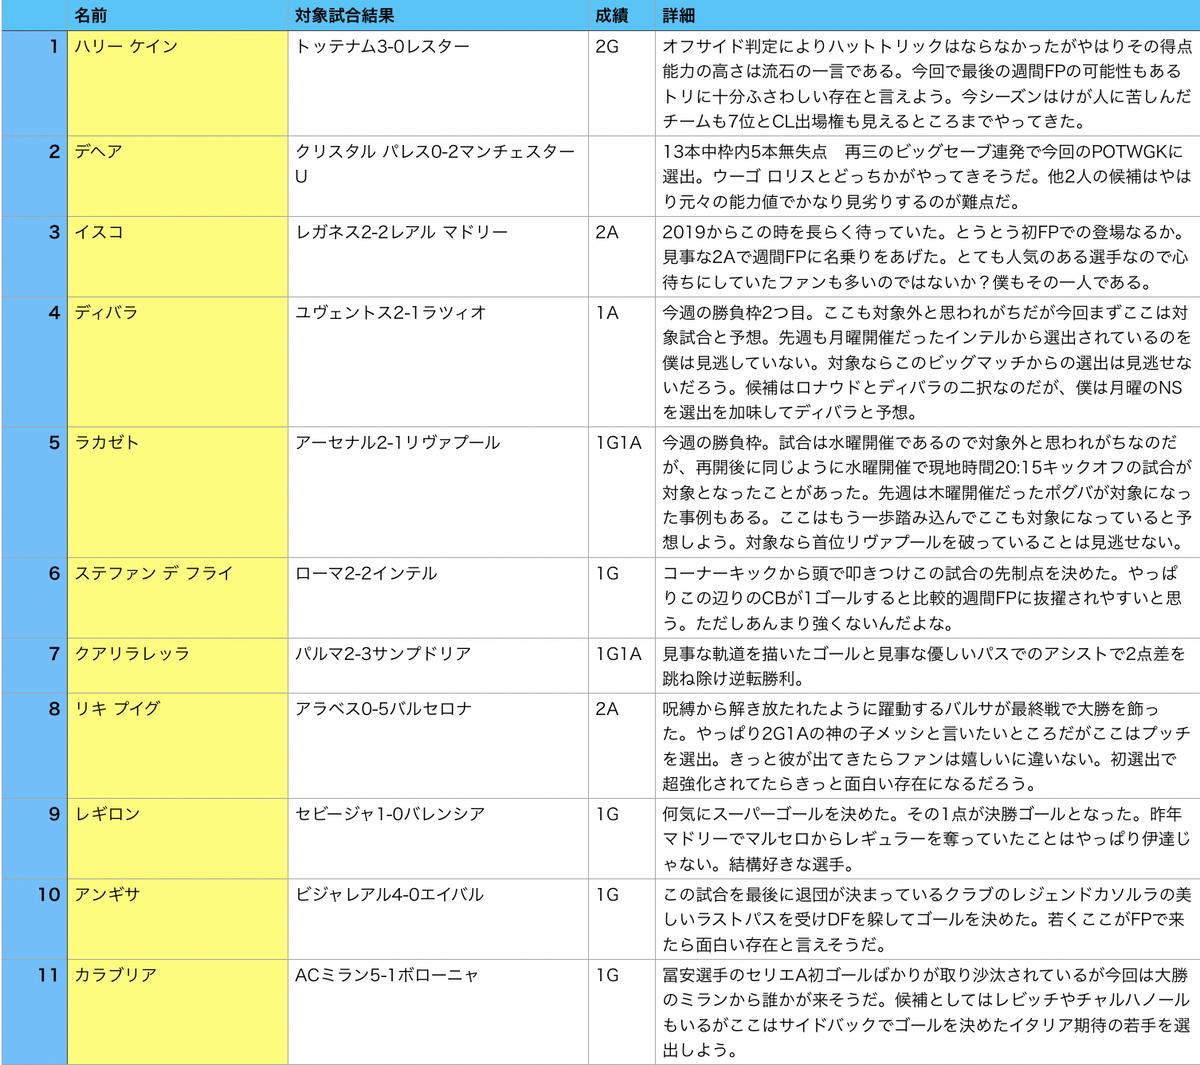 f:id:bokukantoku:20200725221205j:plain